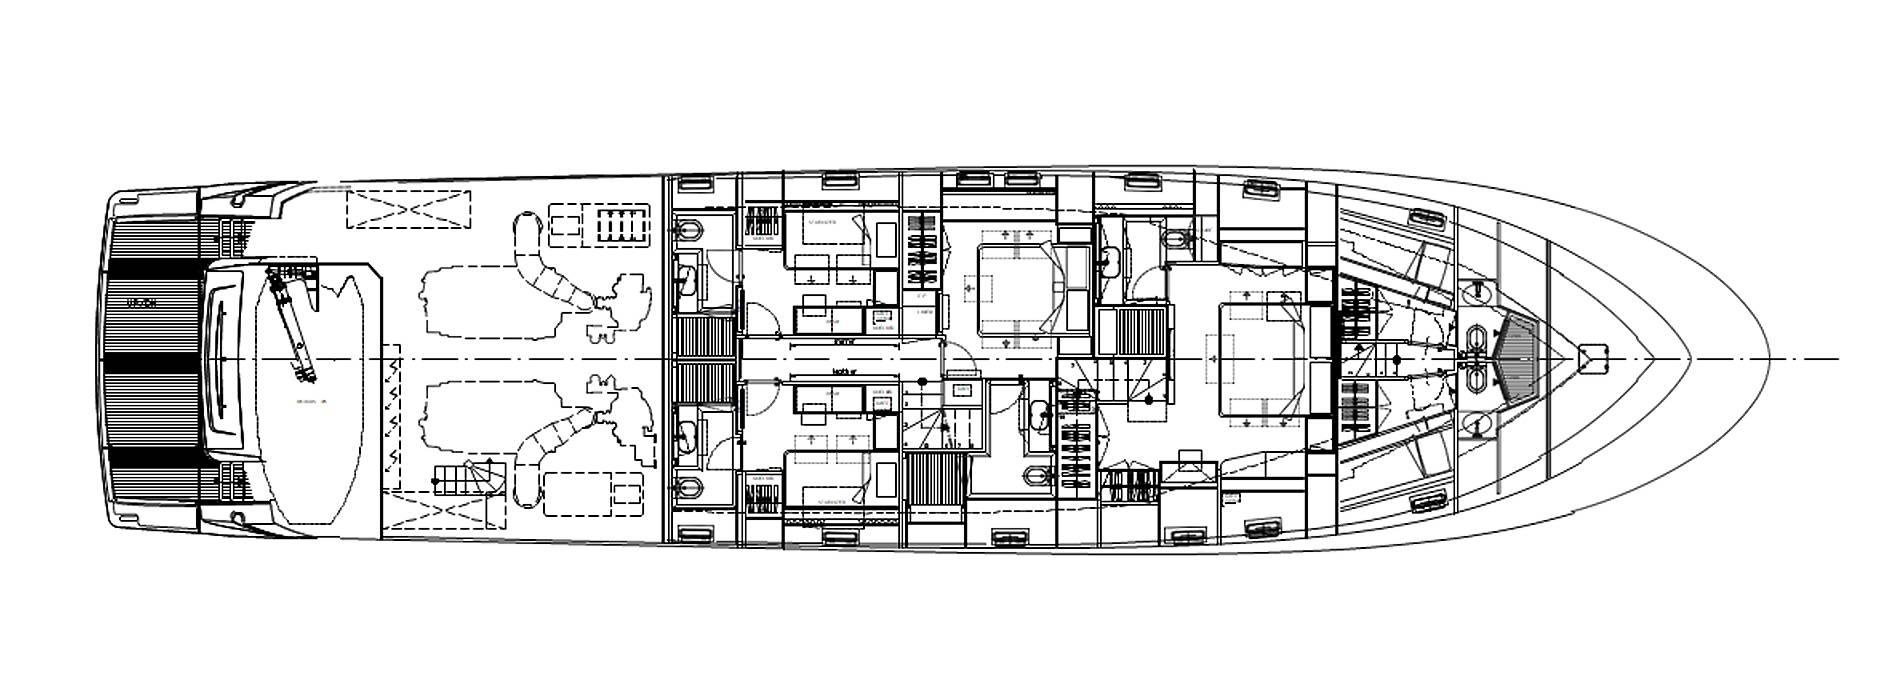 Sanlorenzo Yachts SL96-623 Нижняя палуба